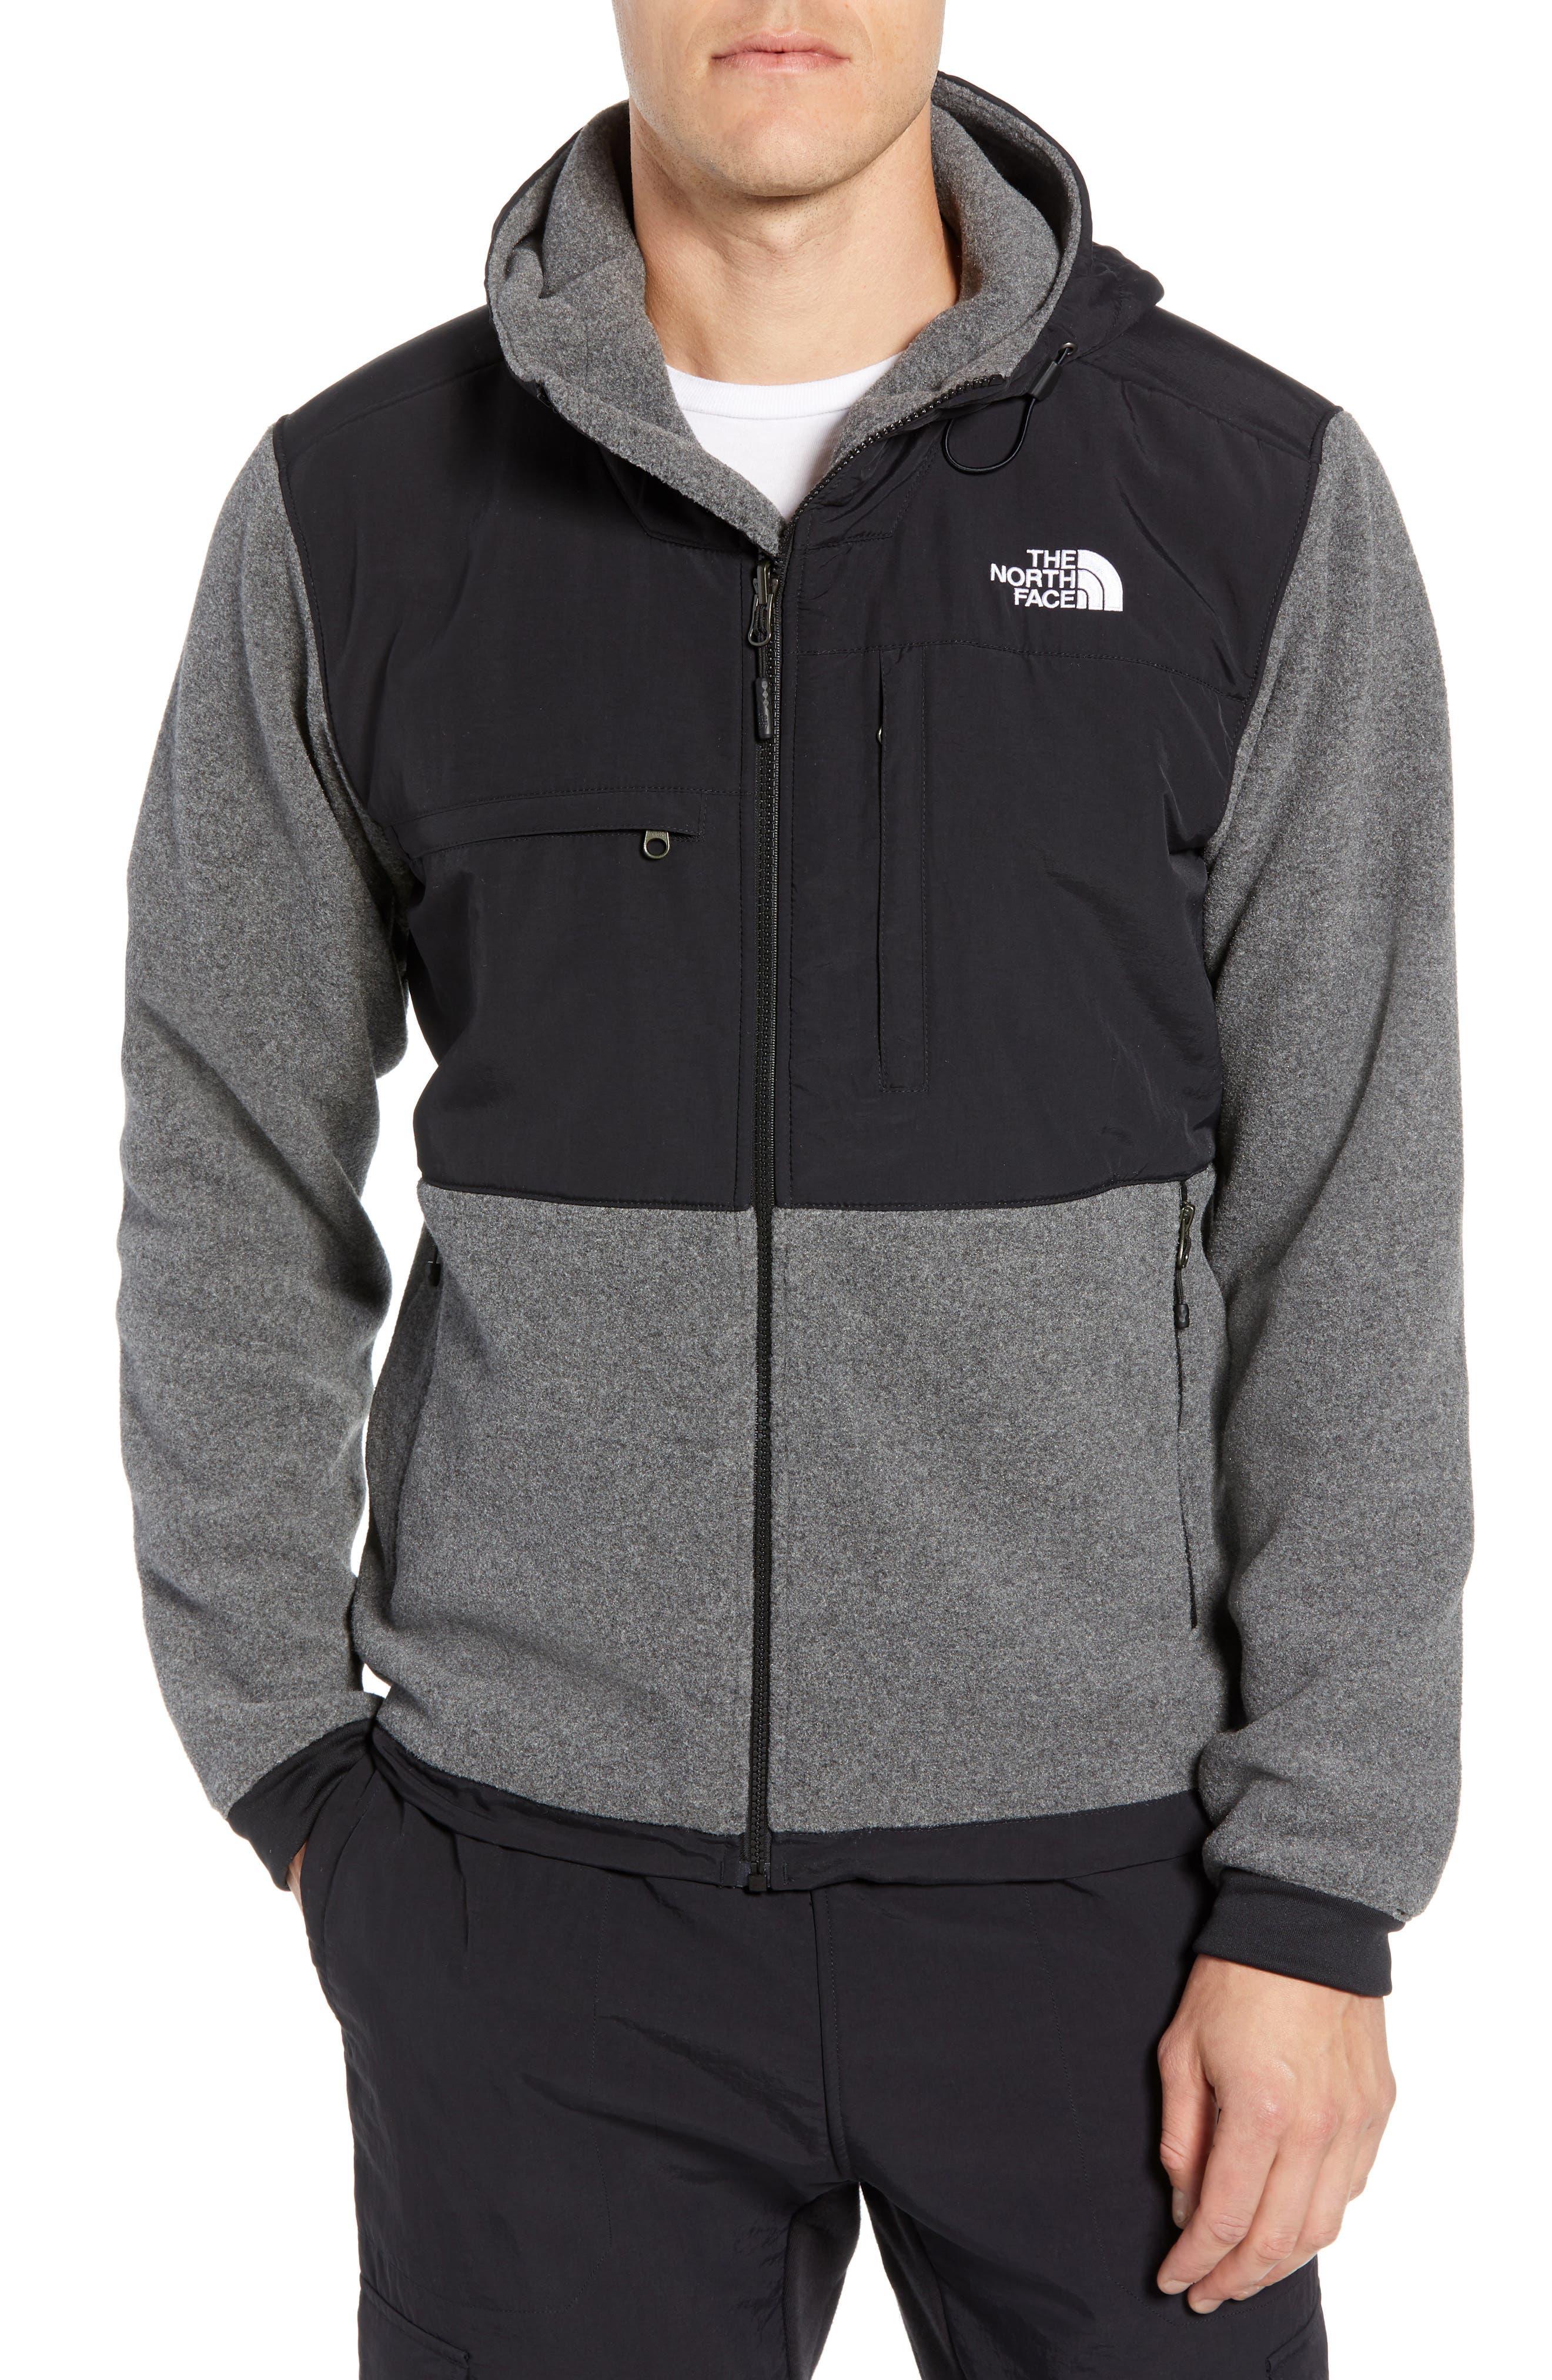 Denali 2 Hooded Jacket,                             Main thumbnail 1, color,                             RECYCLED CHARCOAL GREY HEATHER